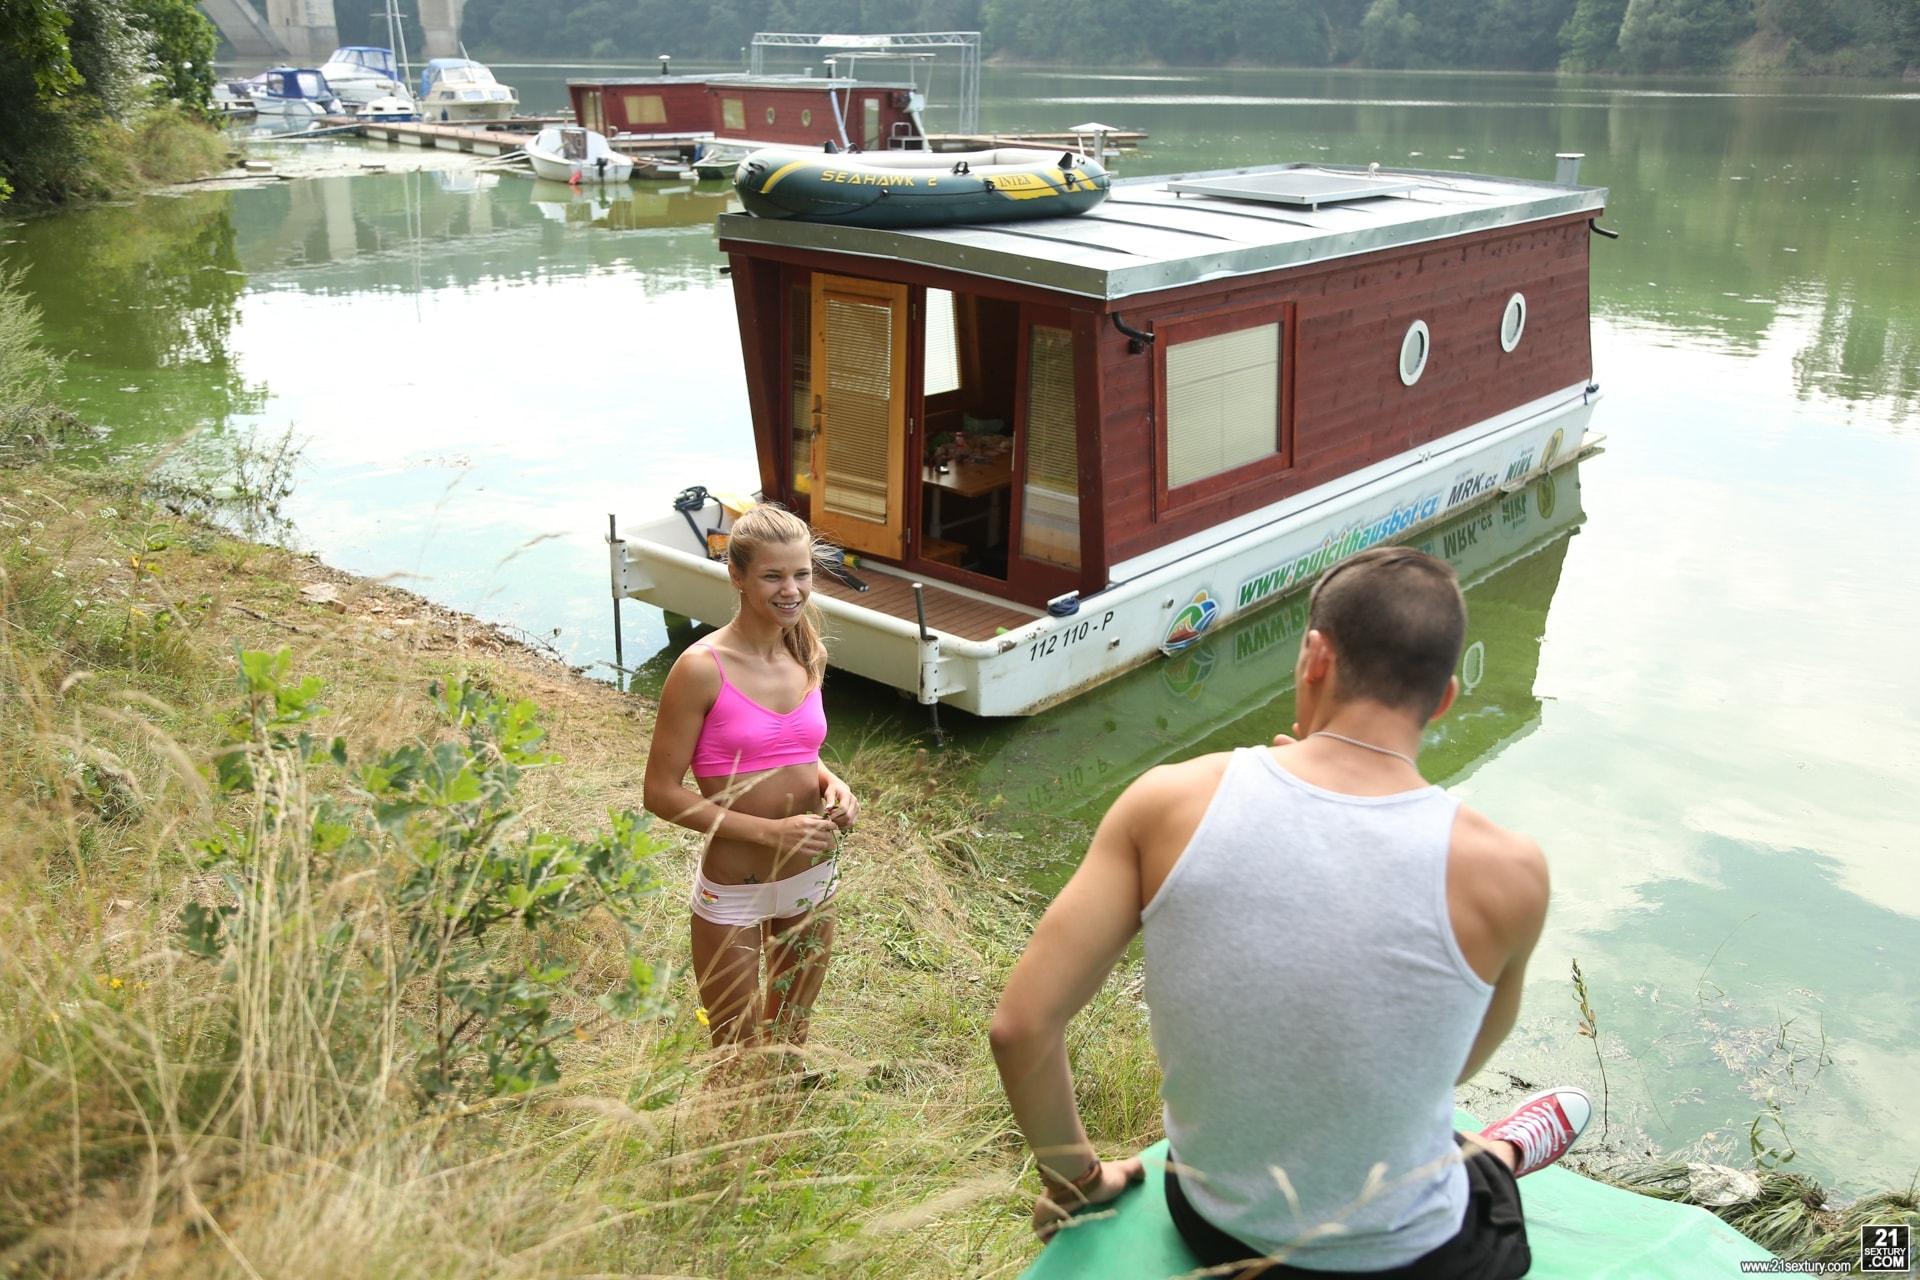 21Sextury 'House Boat Full of Teens' starring Sara Kay (Photo 5)